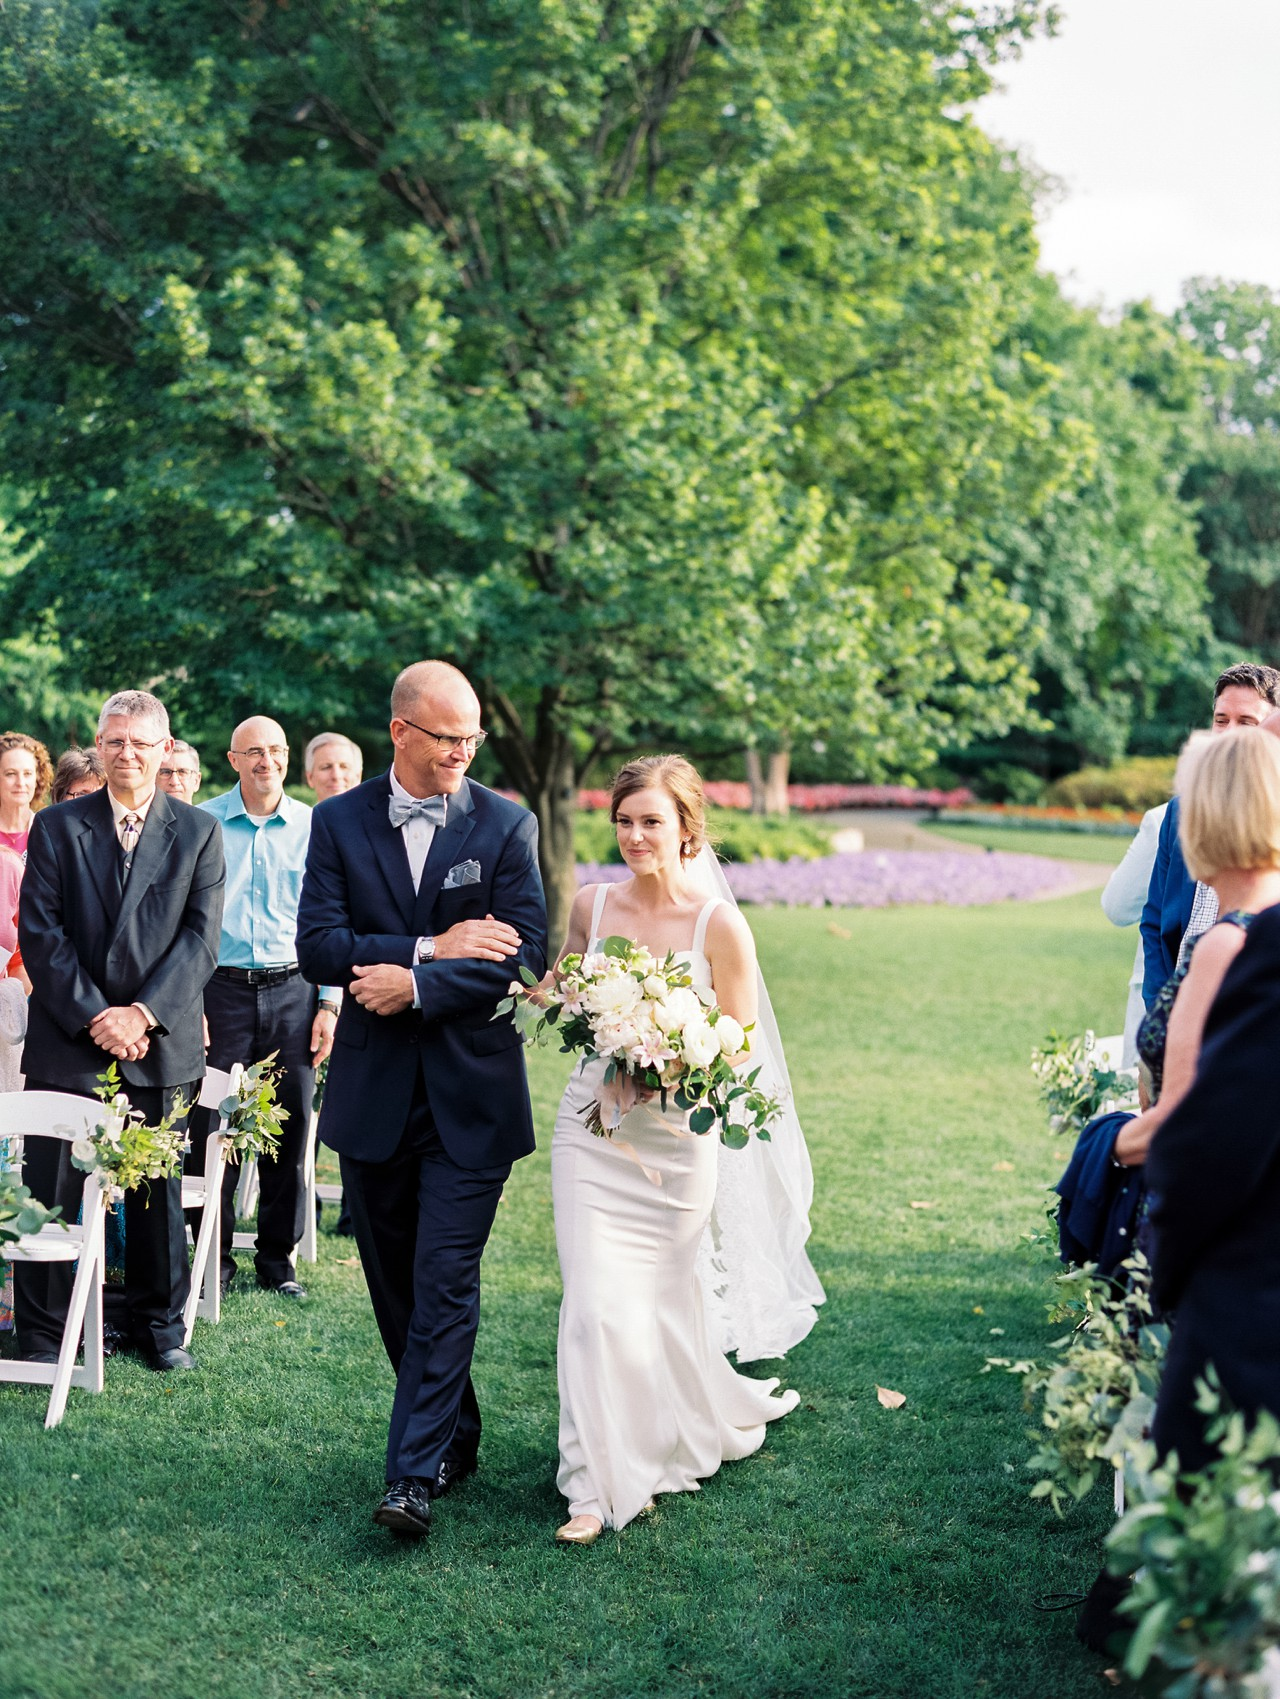 Becca Lea - Texas & Destination Fine Art Wedding Photographer